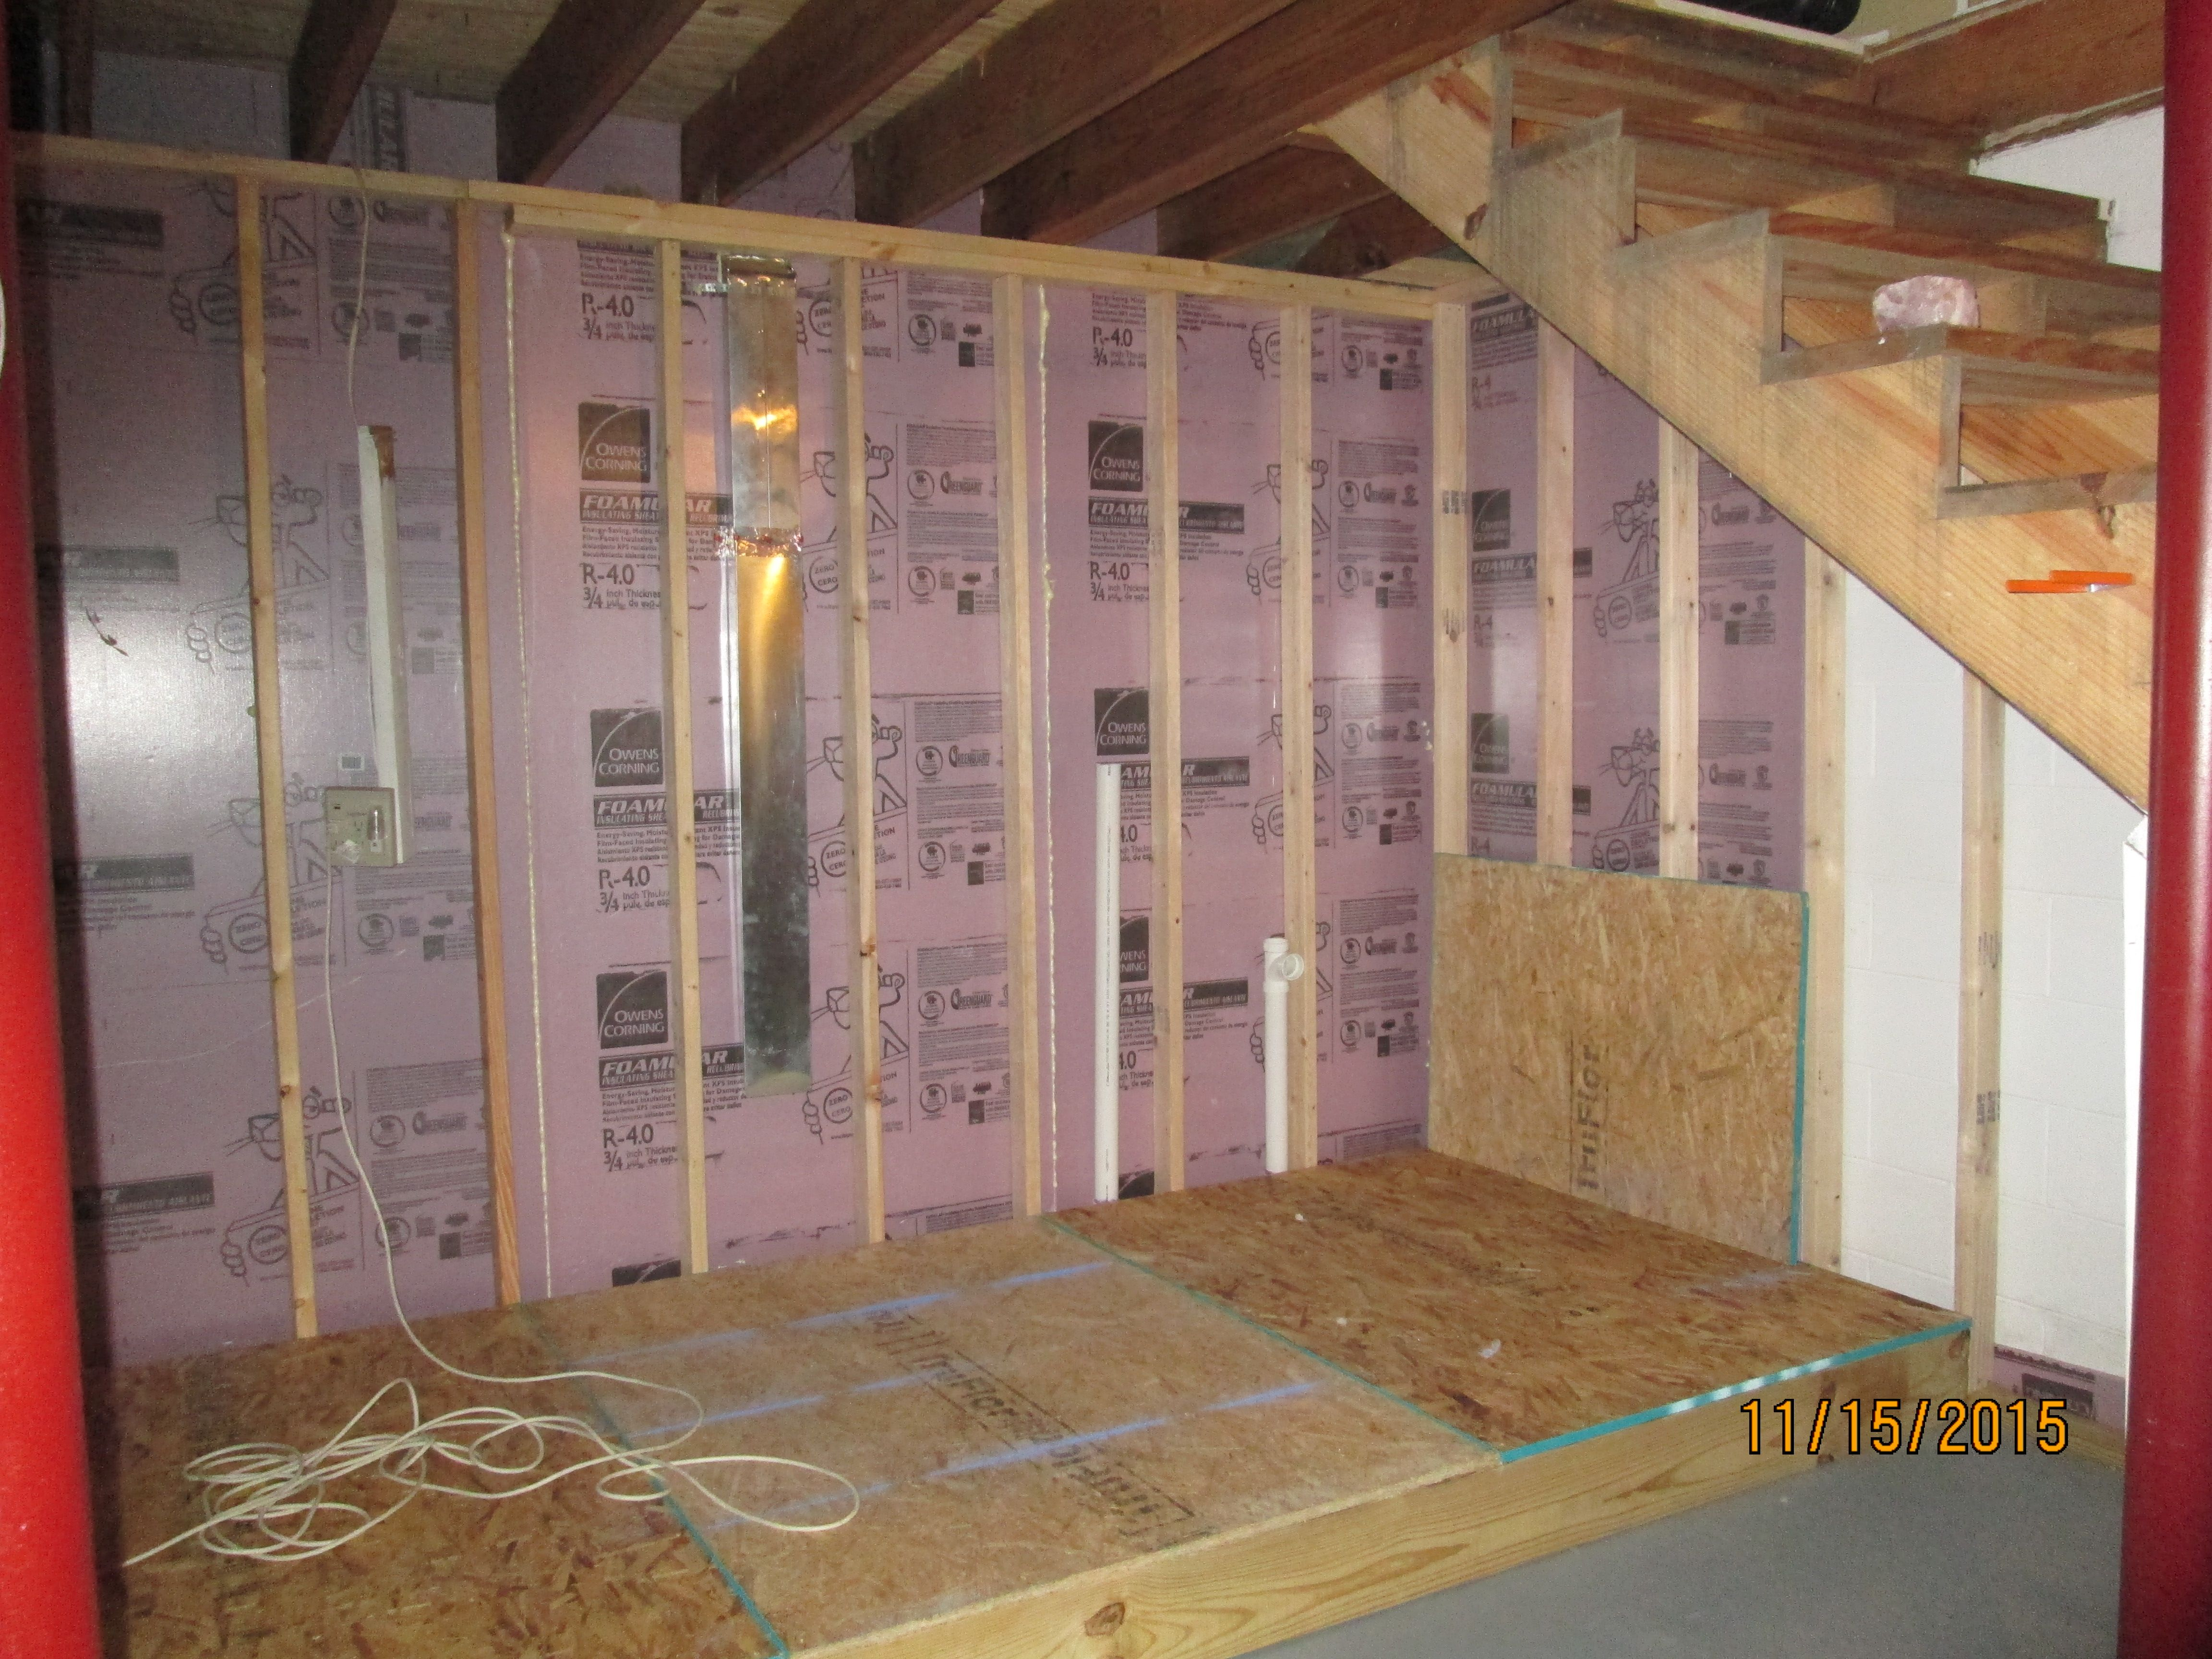 Raised Floor Over Plumbing Laundry Room Bathroom Basement Bathroom Remodeling Bathroom Plumbing Bathrooms Remodel